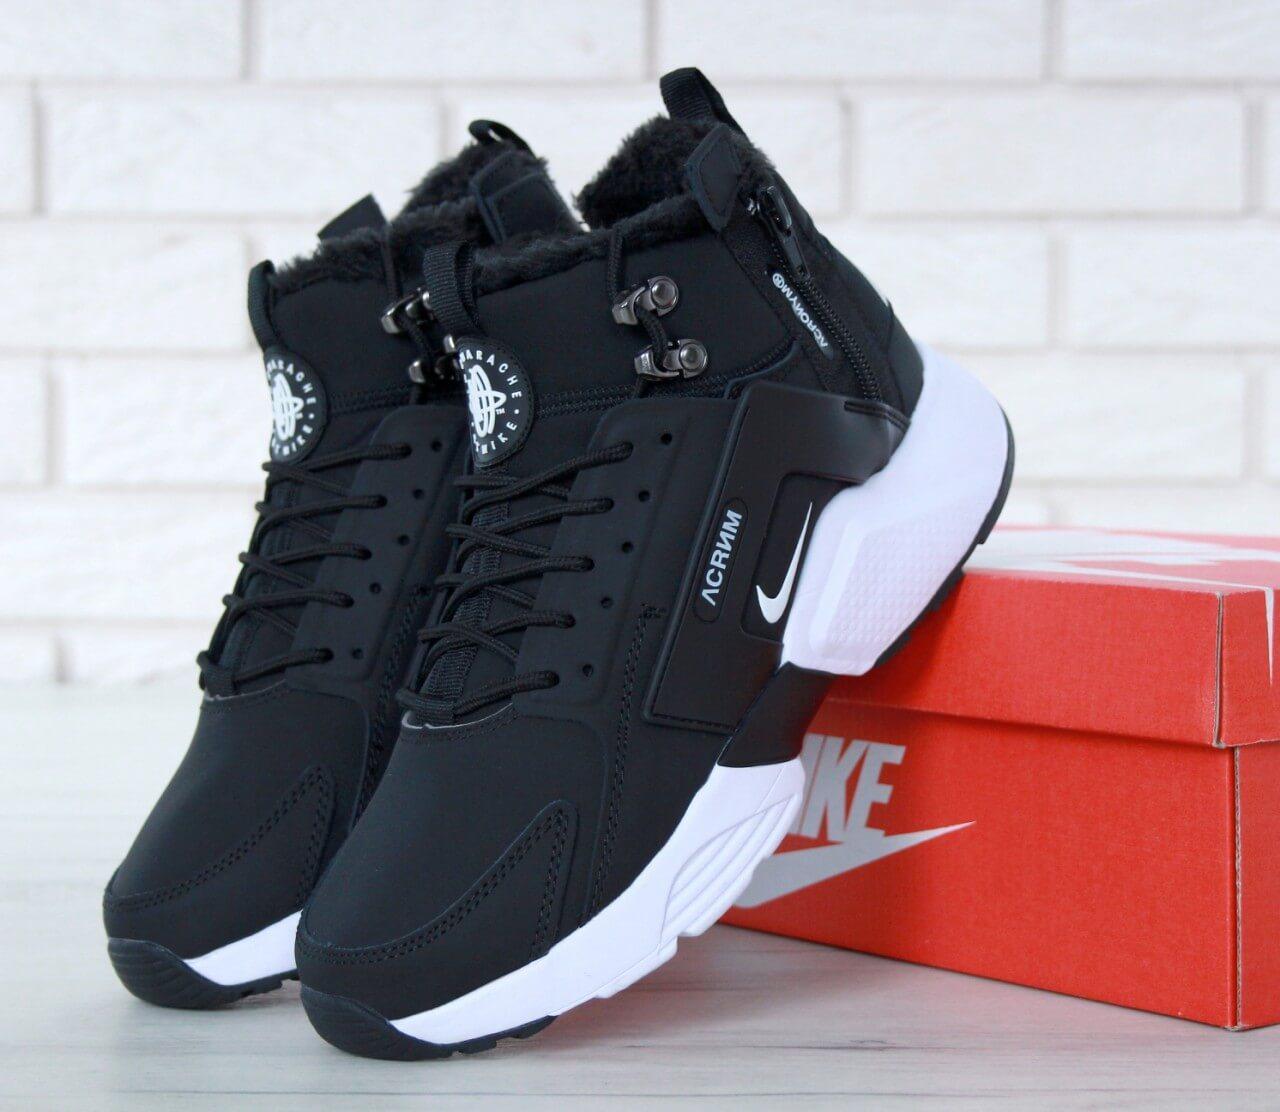 Кроссовки на меху Nike Huarache X Acronym City Winter Black White